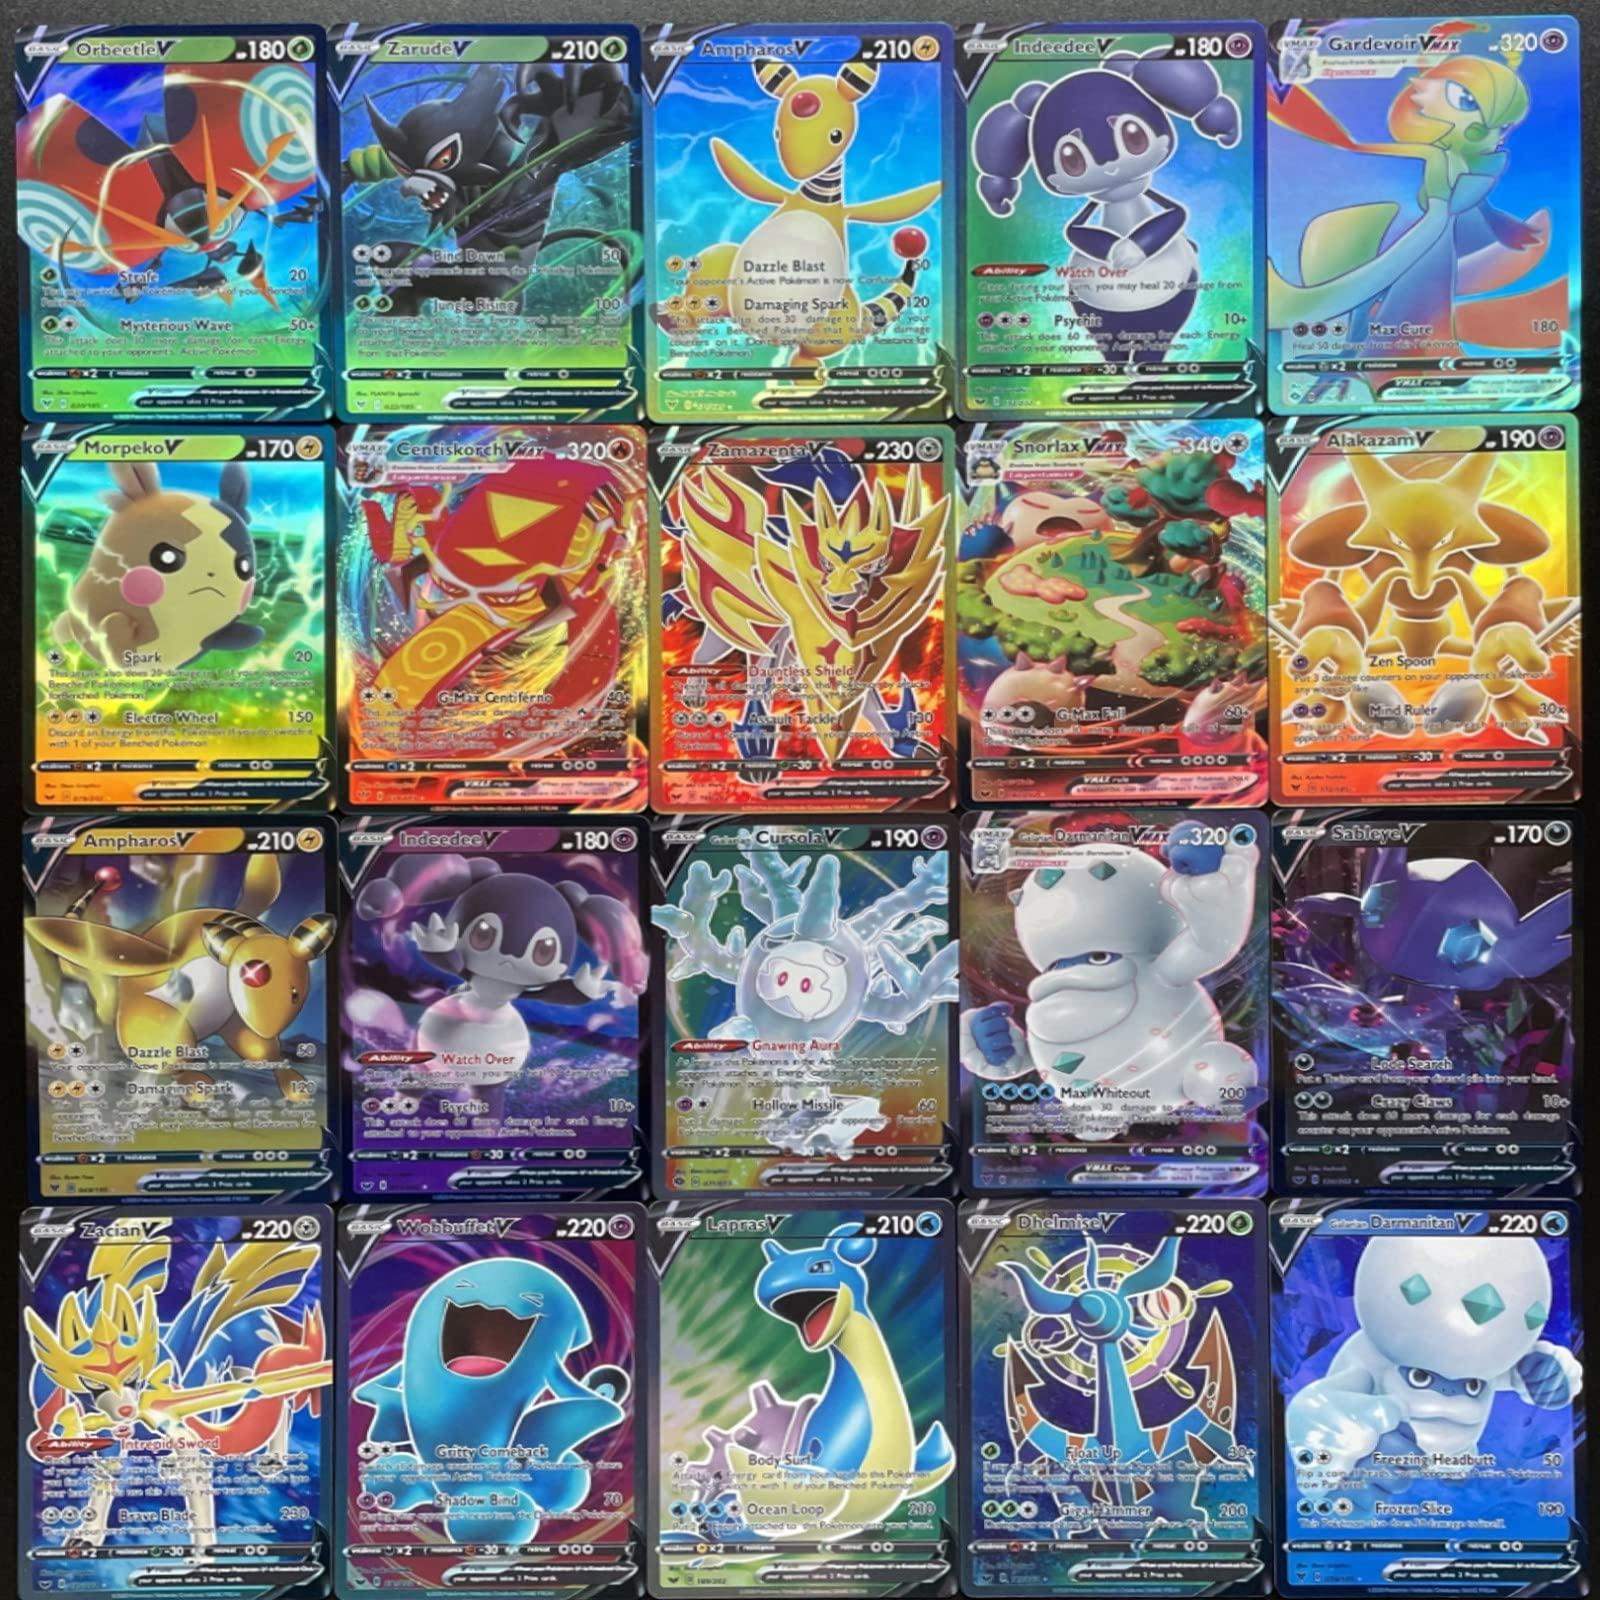 Pokemon Karten Karten - Pokemon schwert evoli